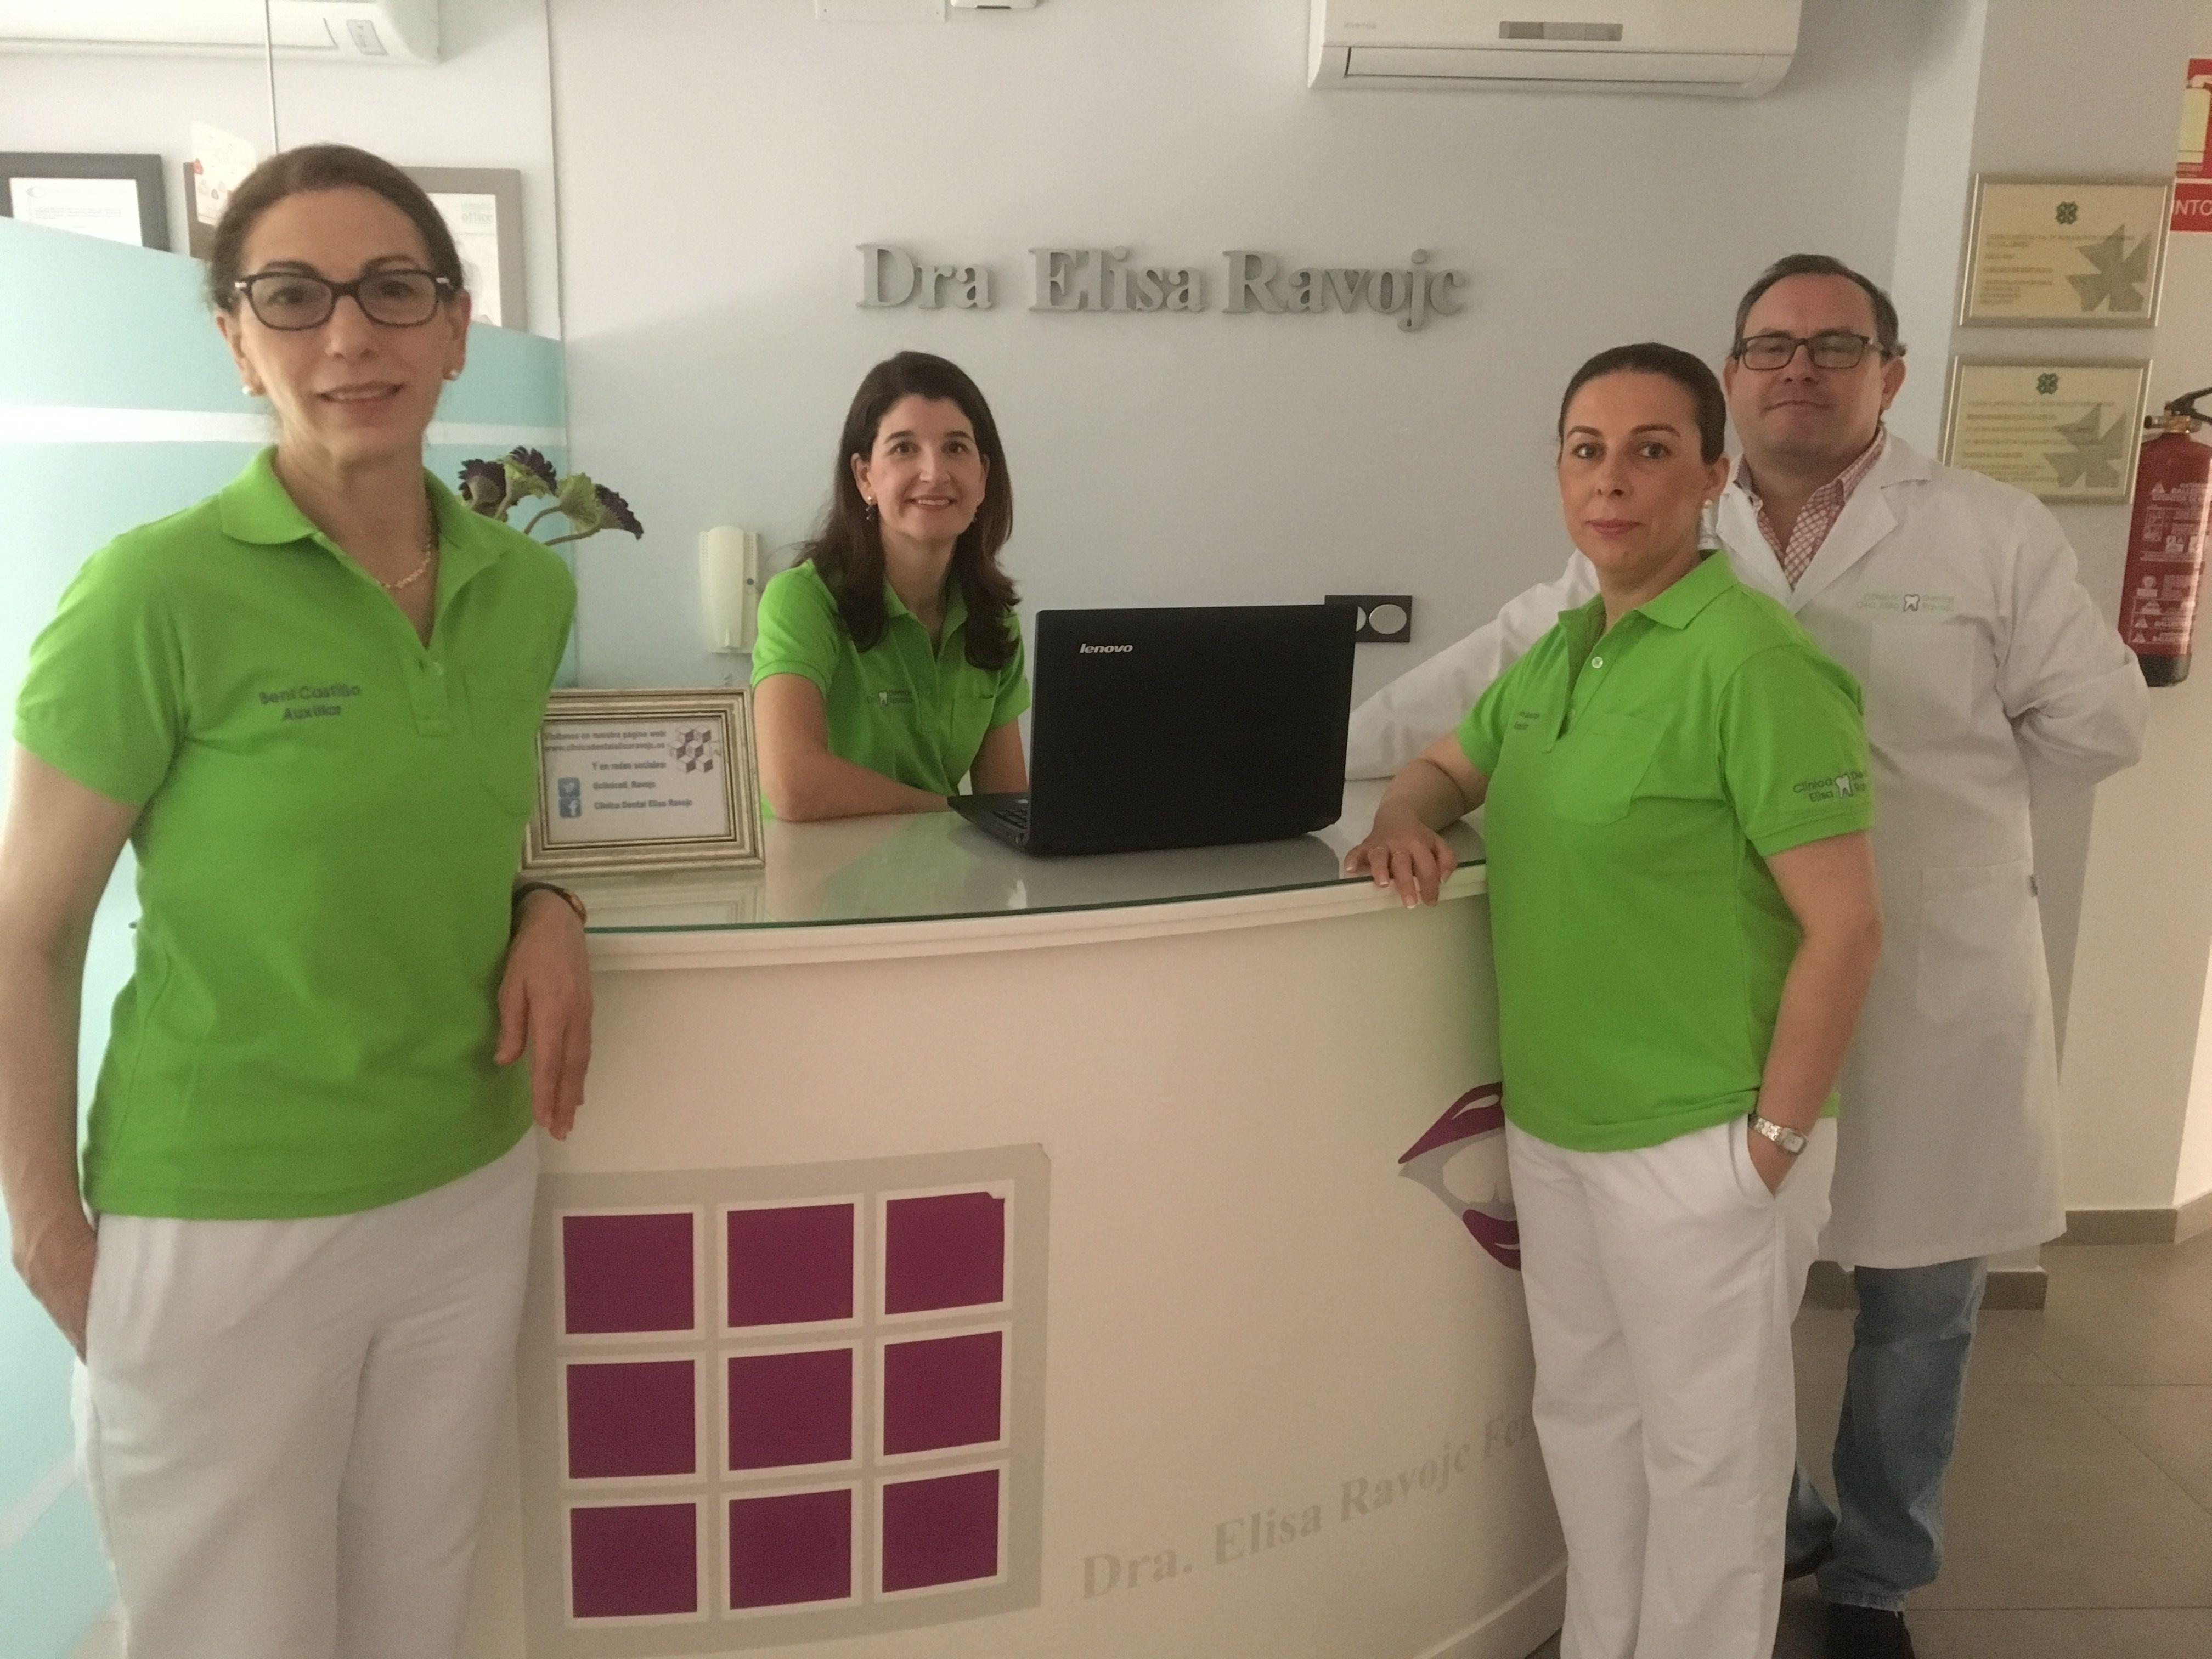 Foto 1 de Clínicas dentales en Andújar | Clinica Dental Elisa Ravojc